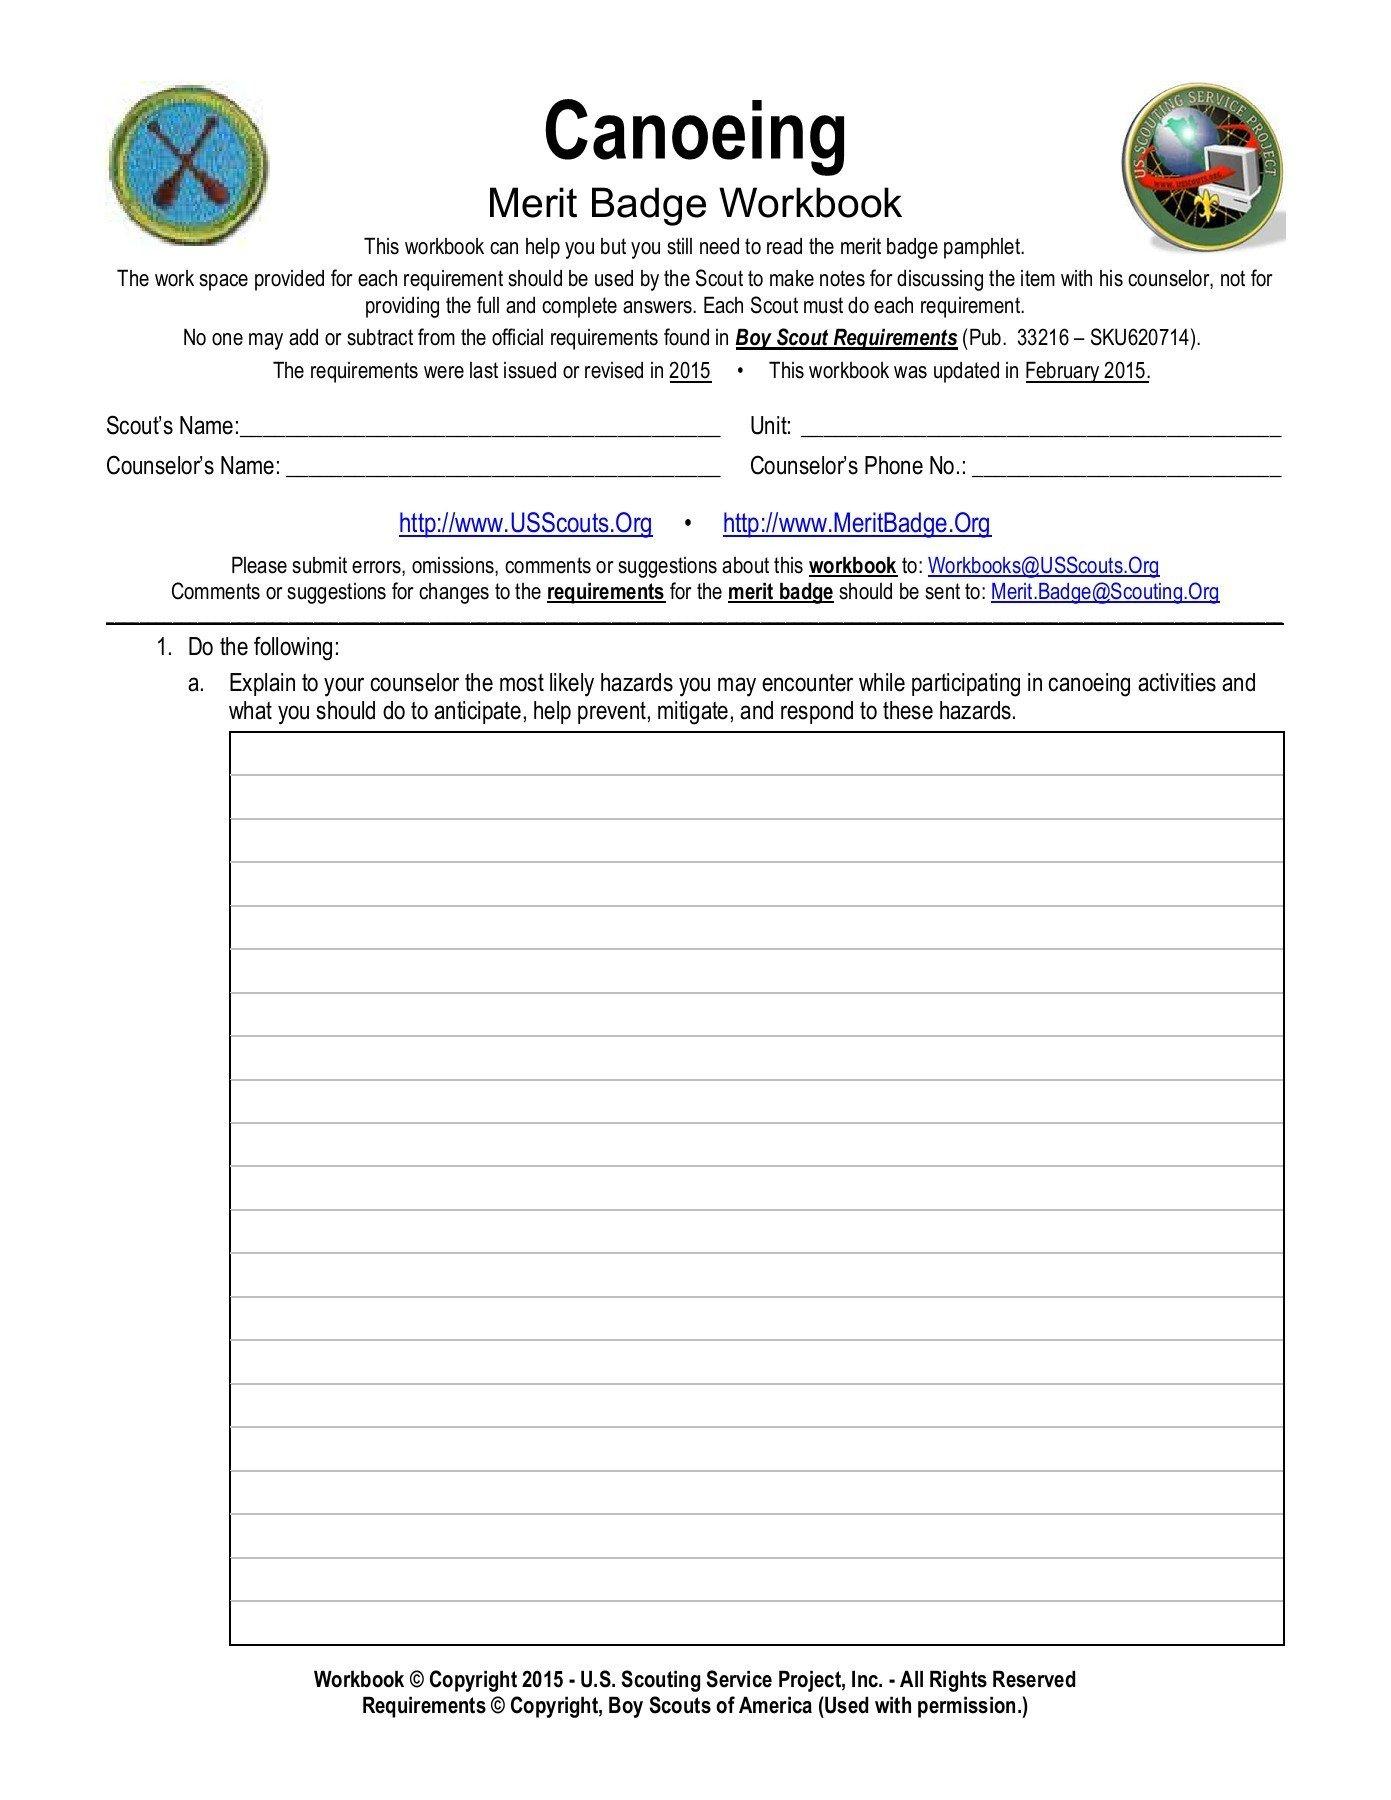 Canoeing Merit Badge Worksheet  Us Scouting Service  Pages 1 Regarding Boy Scout Merit Badge Worksheets